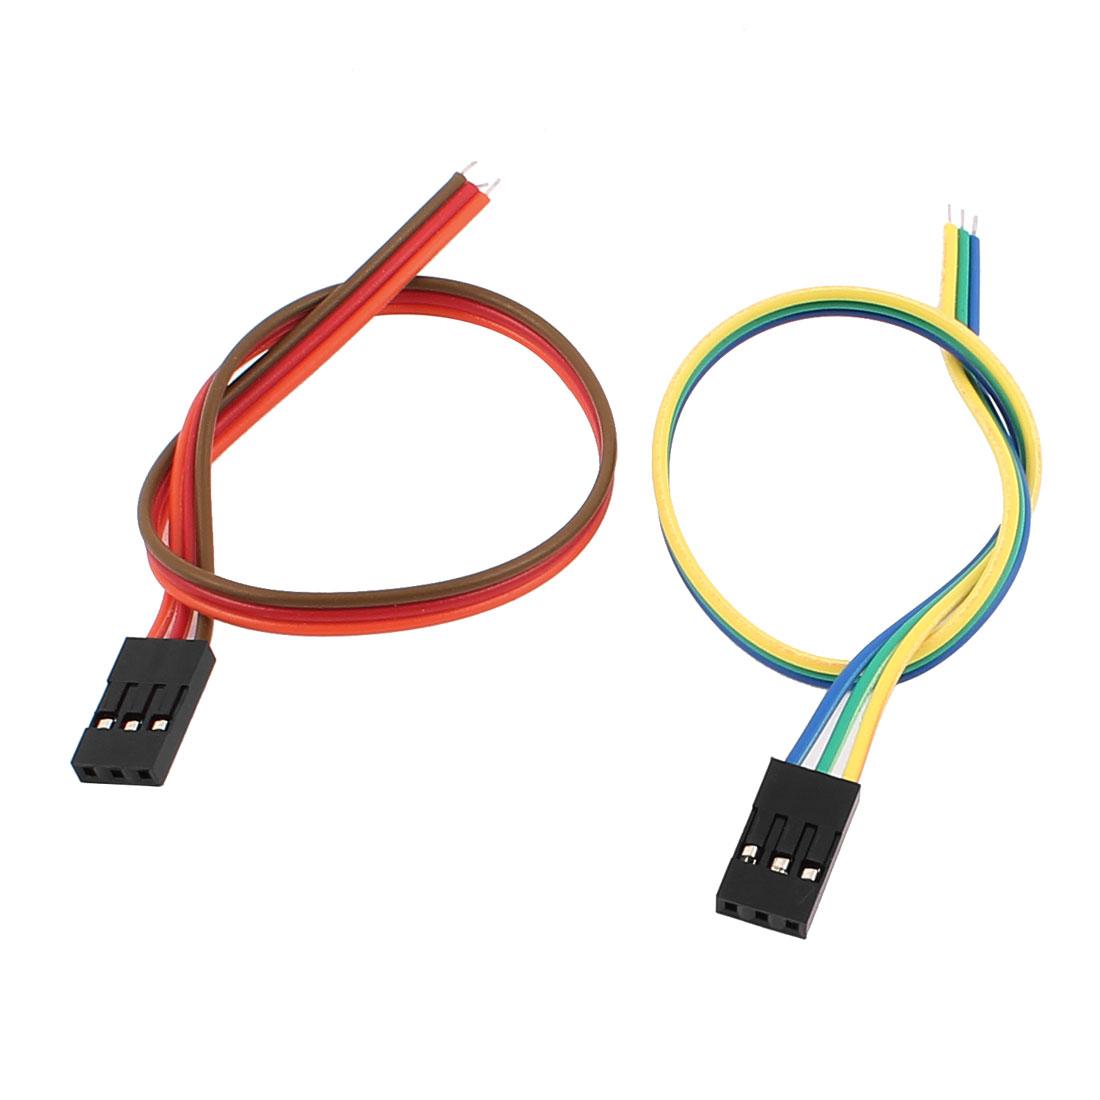 2 Pcs Female 3P Jumper Wires Ribbon Cables Pi Pic Breadboard DIY 20cm Long